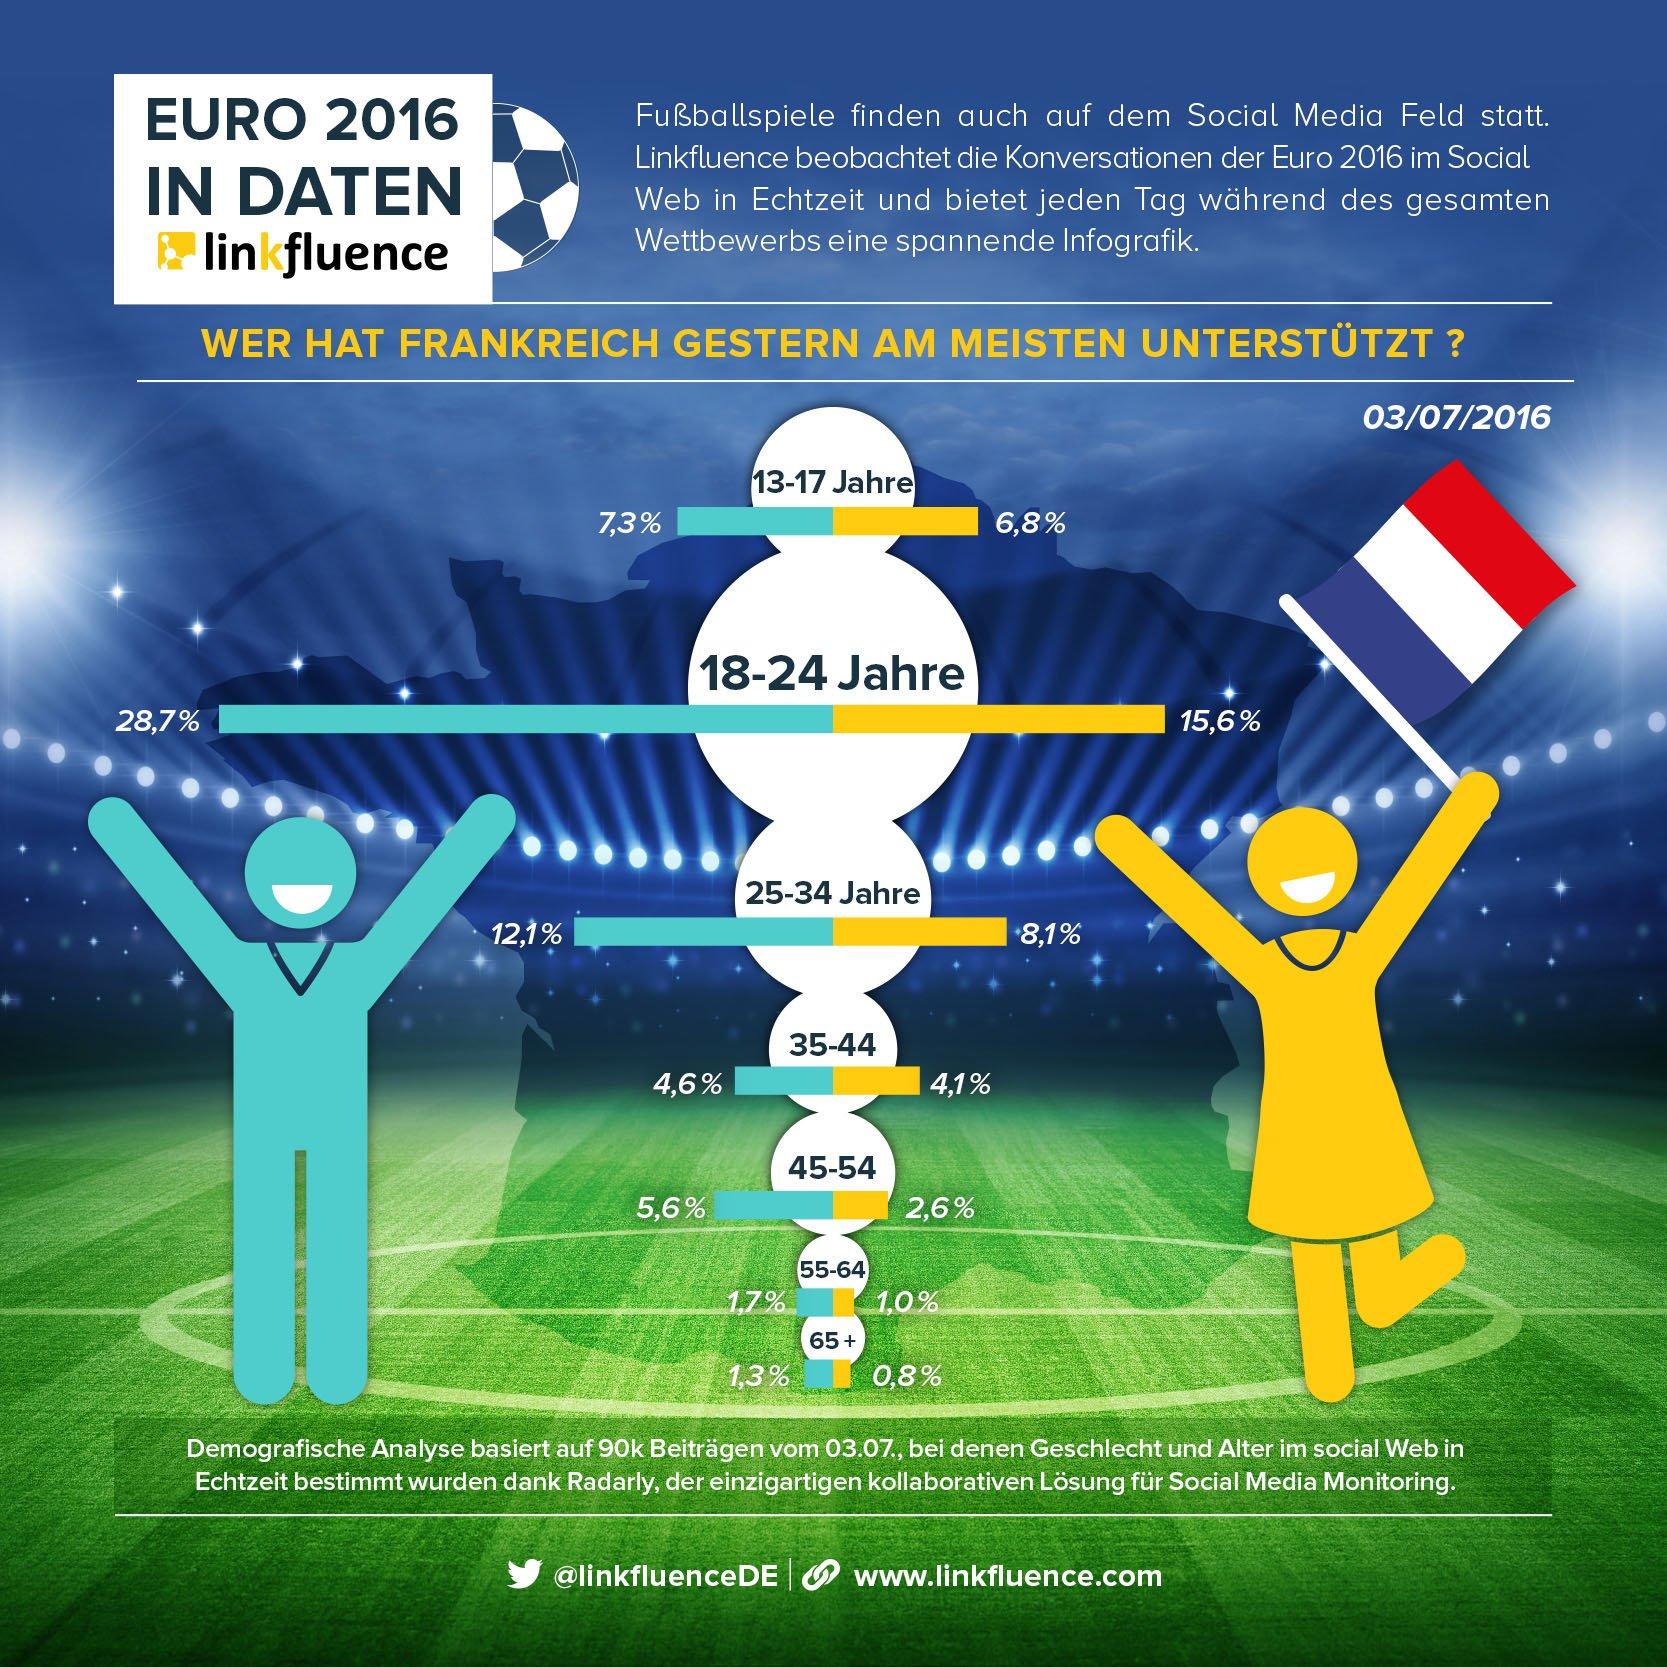 SEUL_EURO2016_CapsuleDigitale_Dimanche03-07_v1